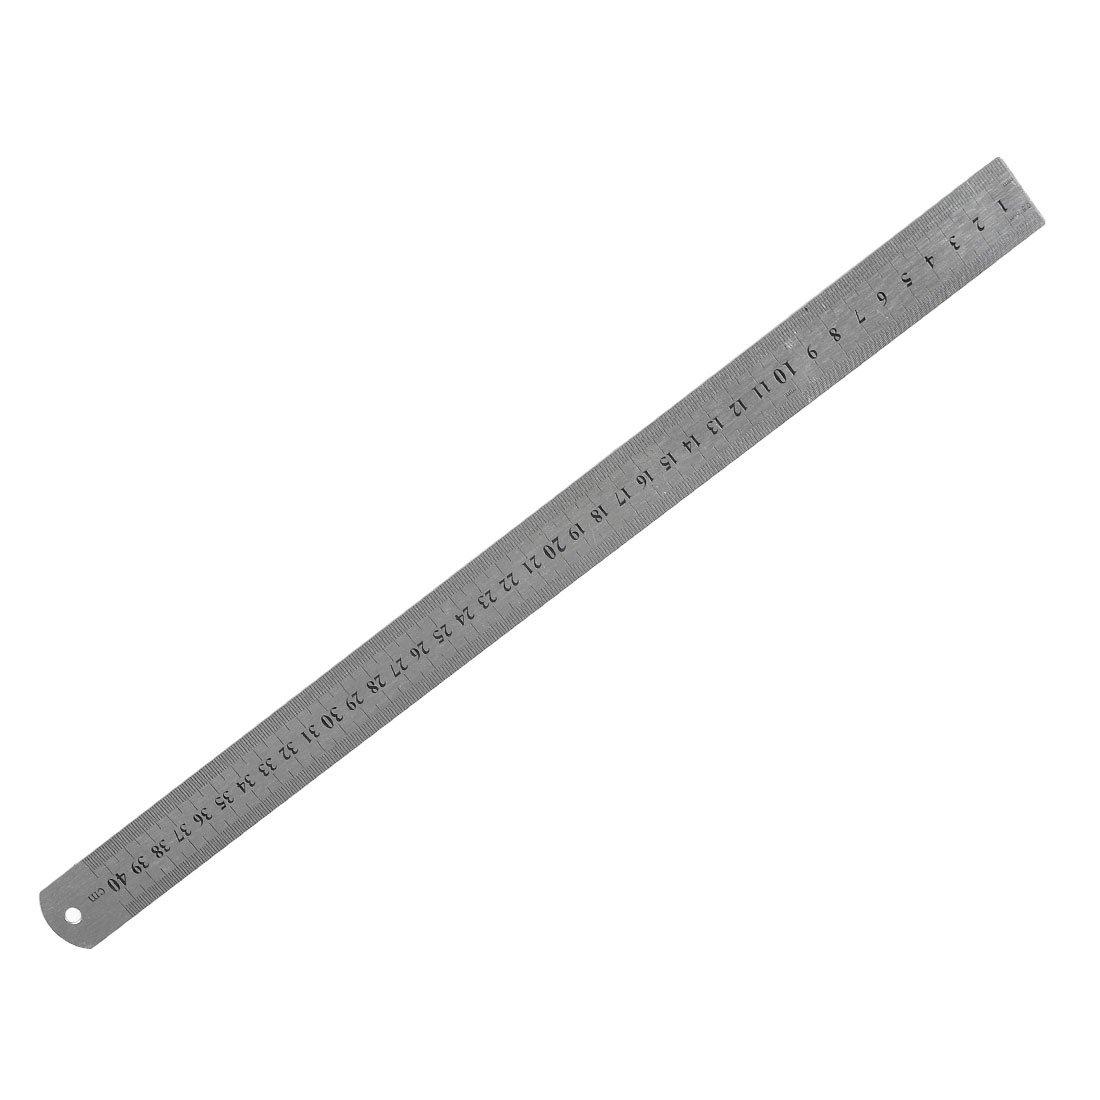 Stainless Steel 16 Inch Straight Ruler Measuring Kit Metric 40cm Lw